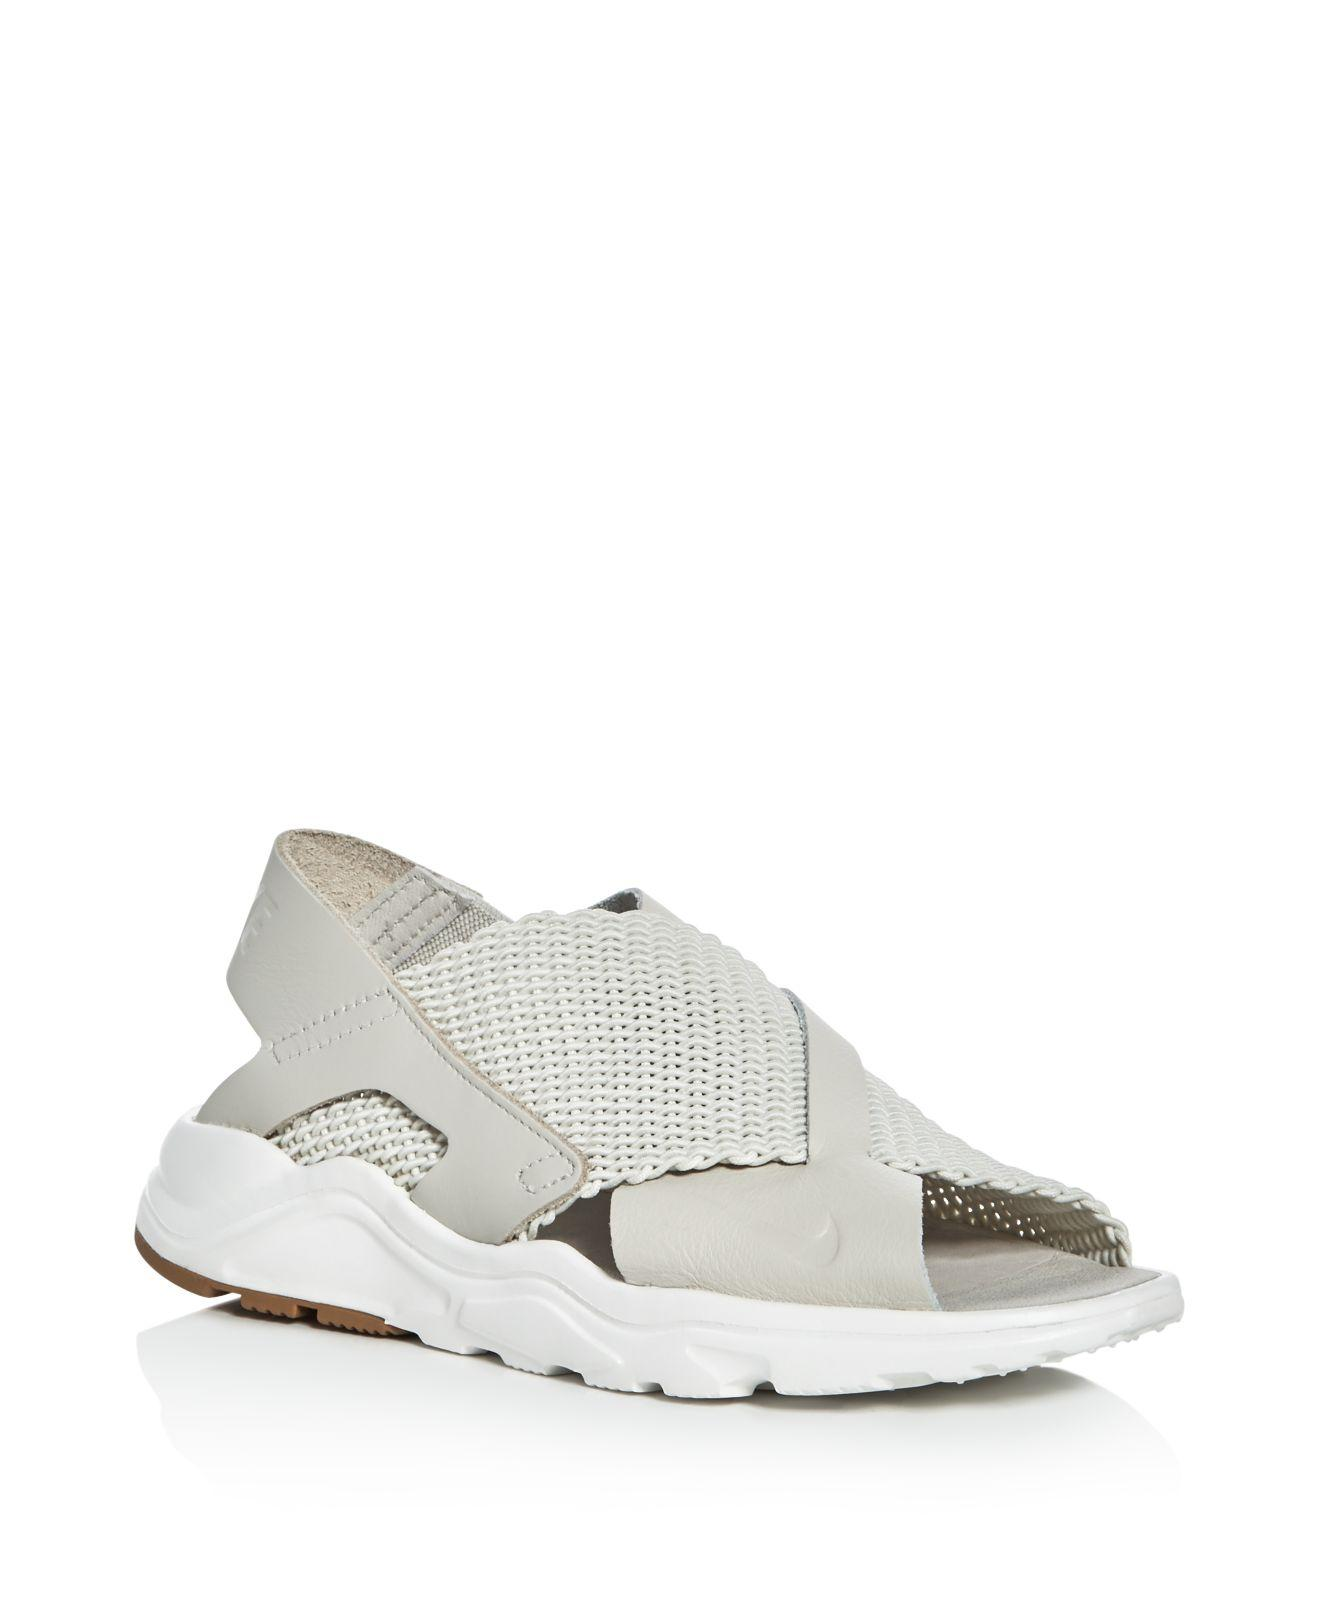 Air Huarache Huarache Ultra Sandal Sort Shoessale